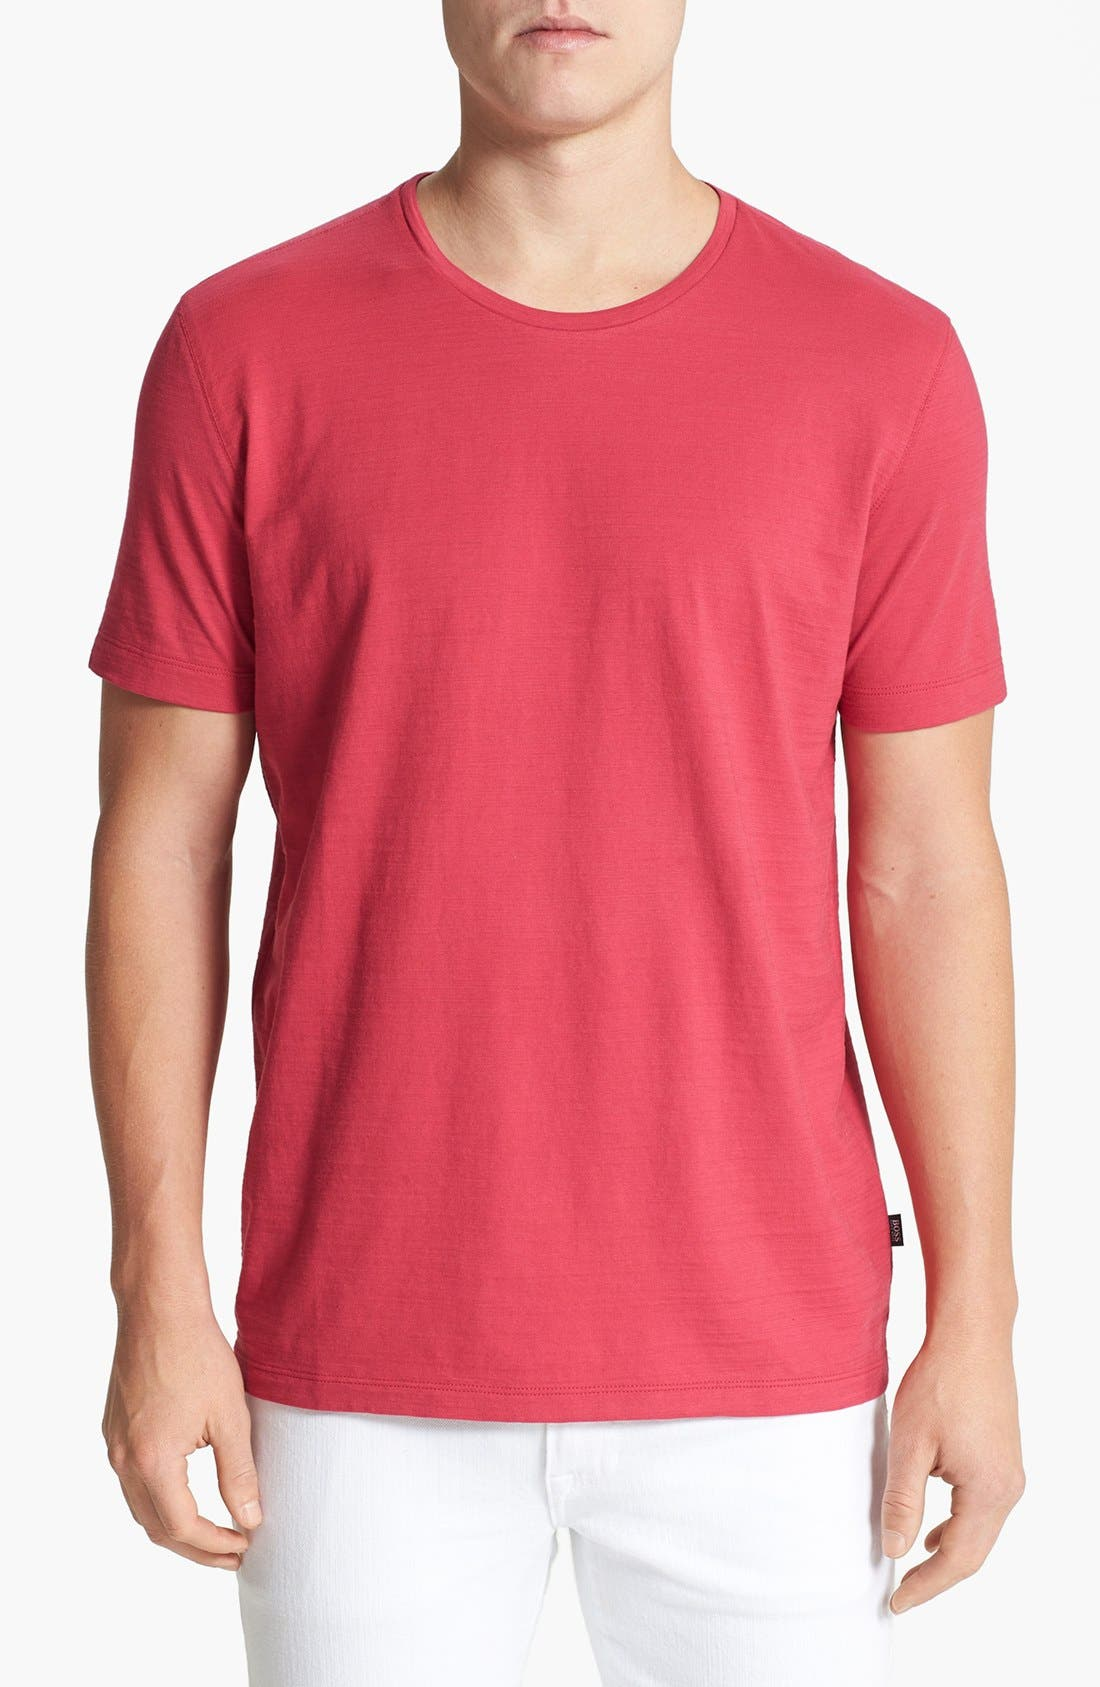 Alternate Image 1 Selected - BOSS HUGO BOSS 'Terni 103' Regular Fit Crewneck T-Shirt